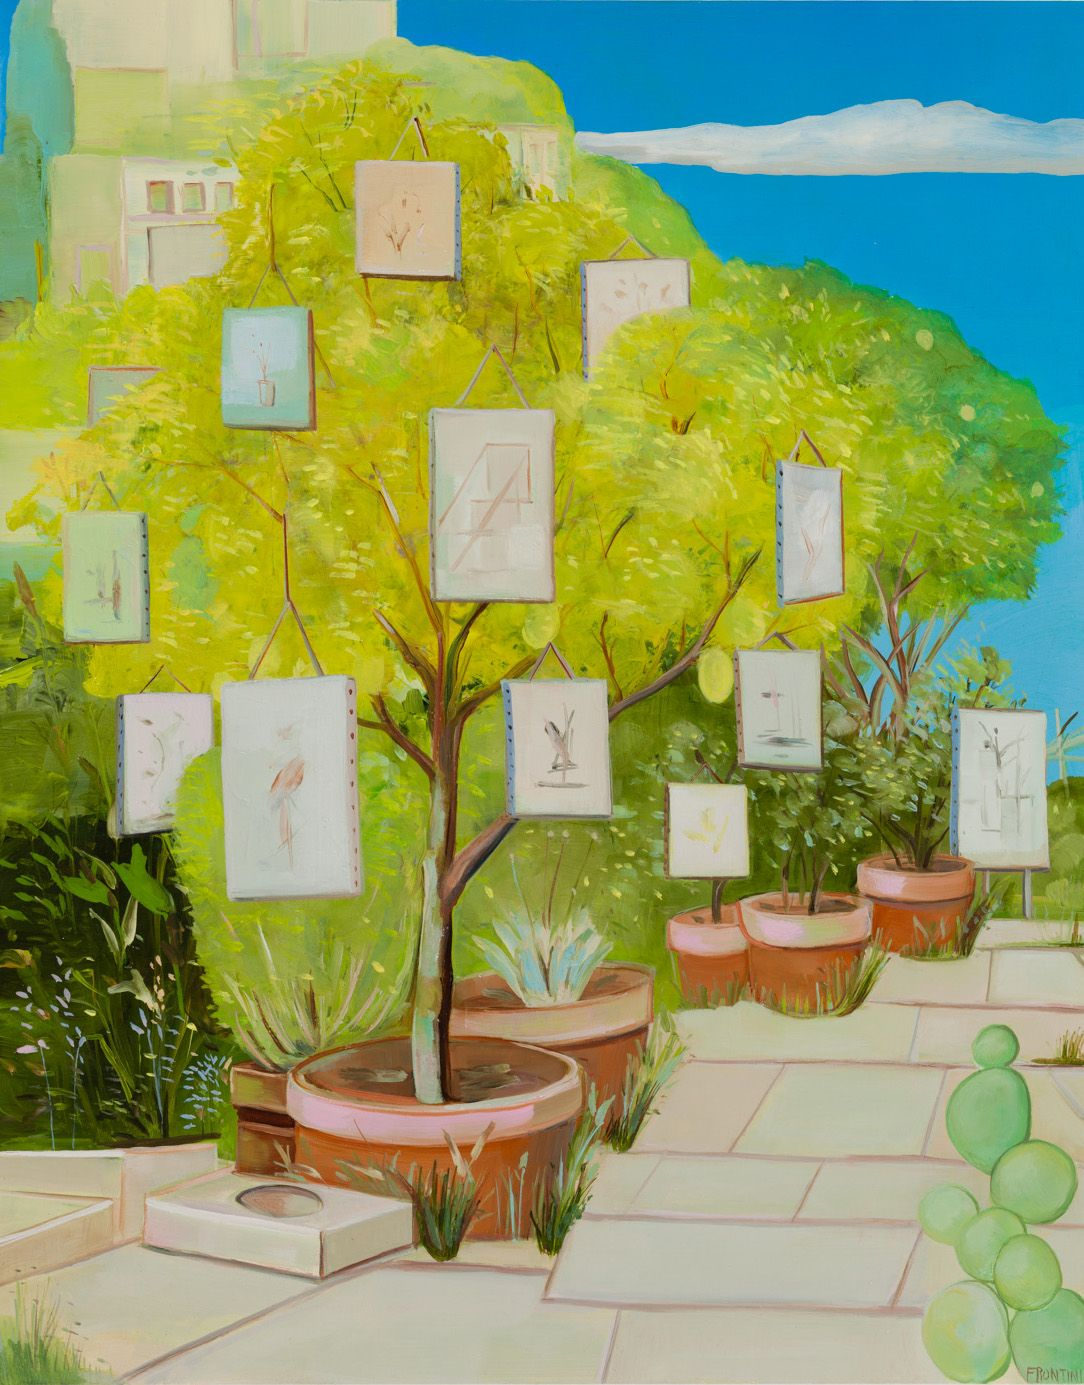 Backyard Retrospective Exhibition, Silverlake, CA